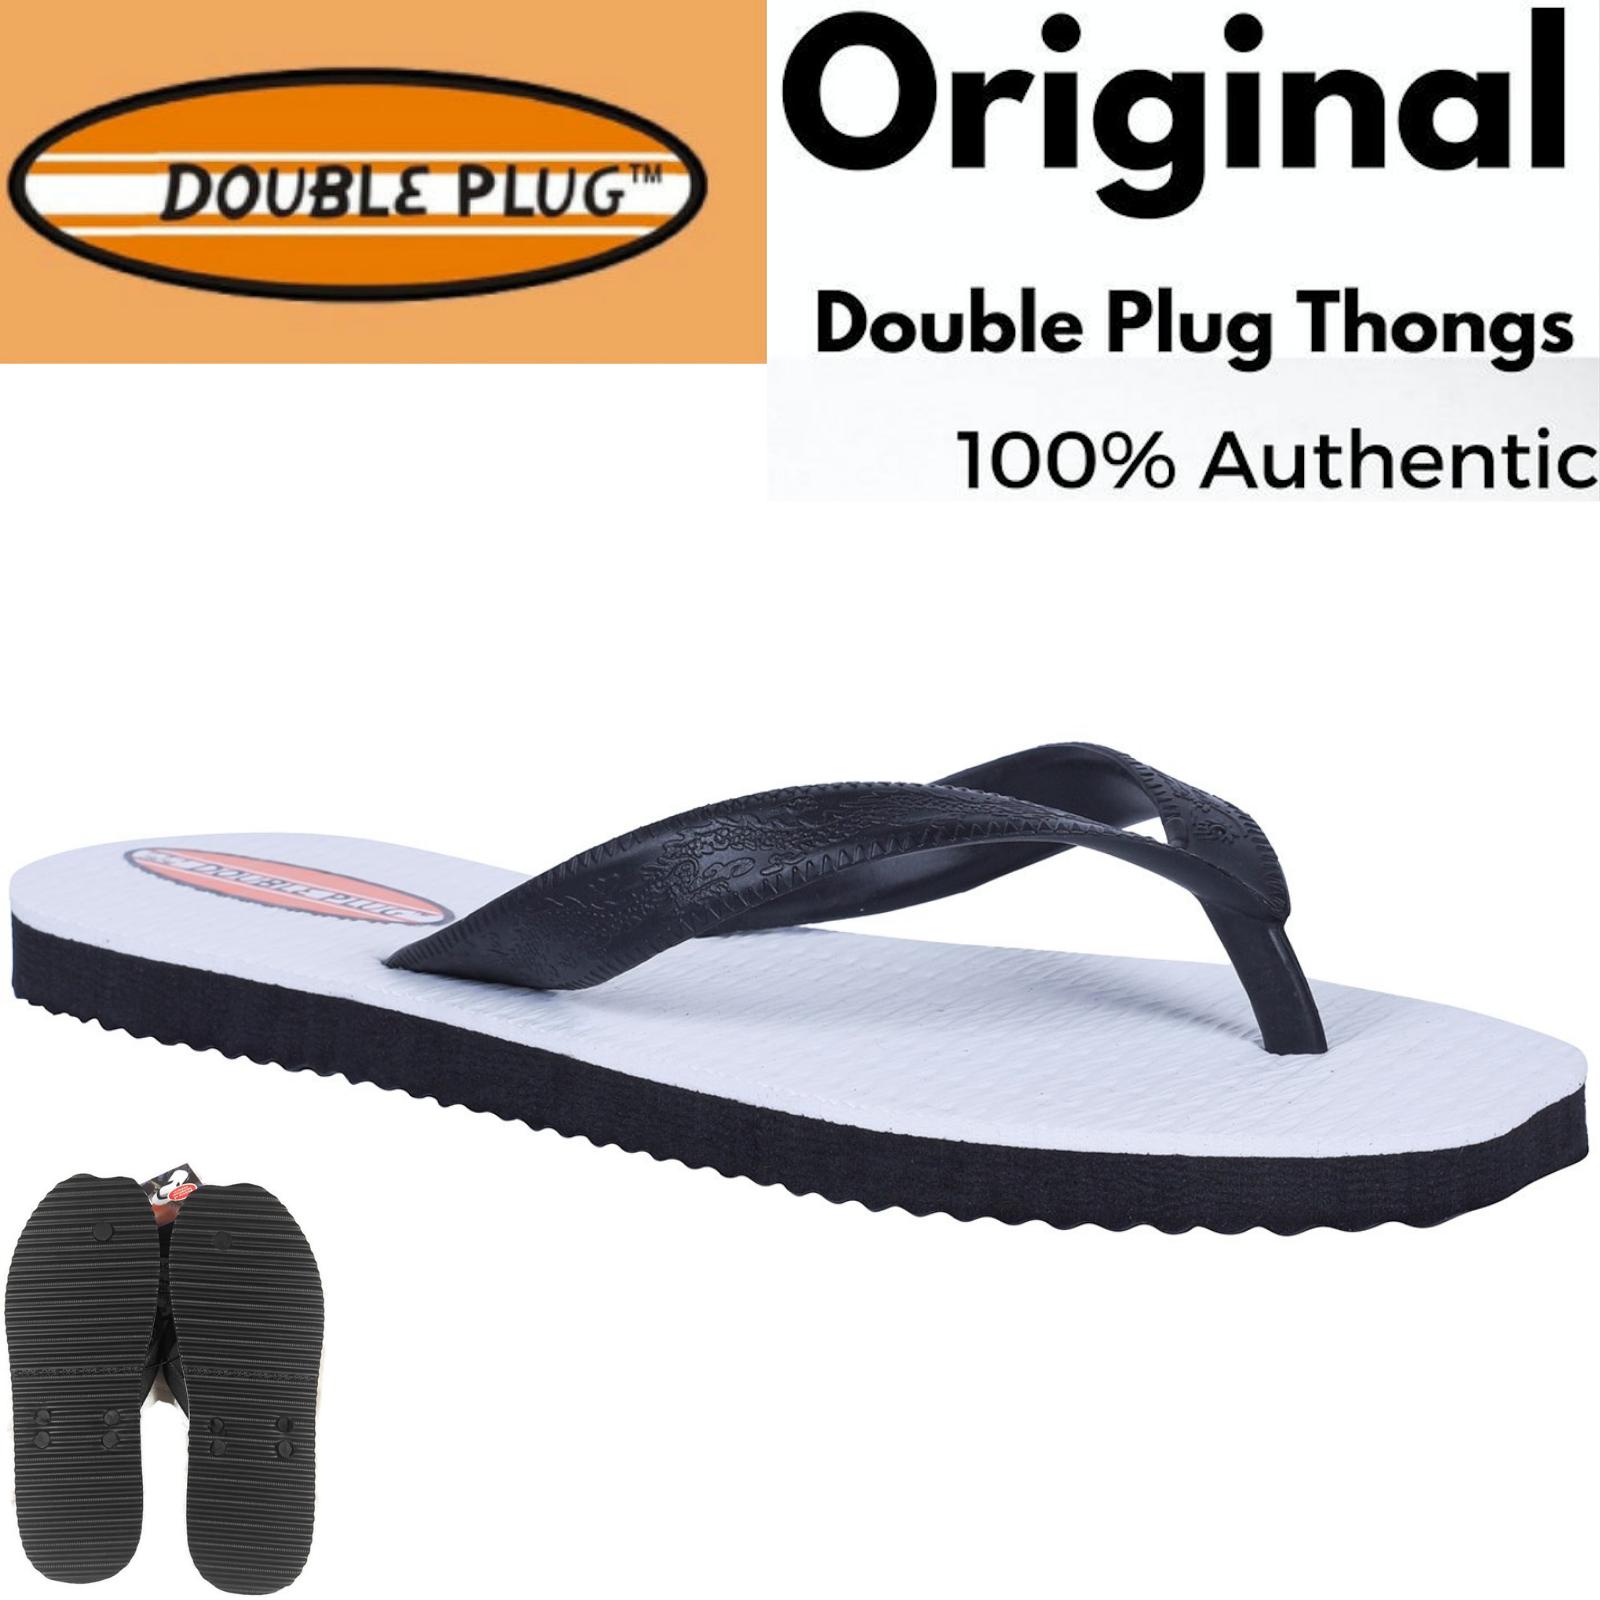 ORIGINAL DOUBLE PLUG Thongs Flip Flops